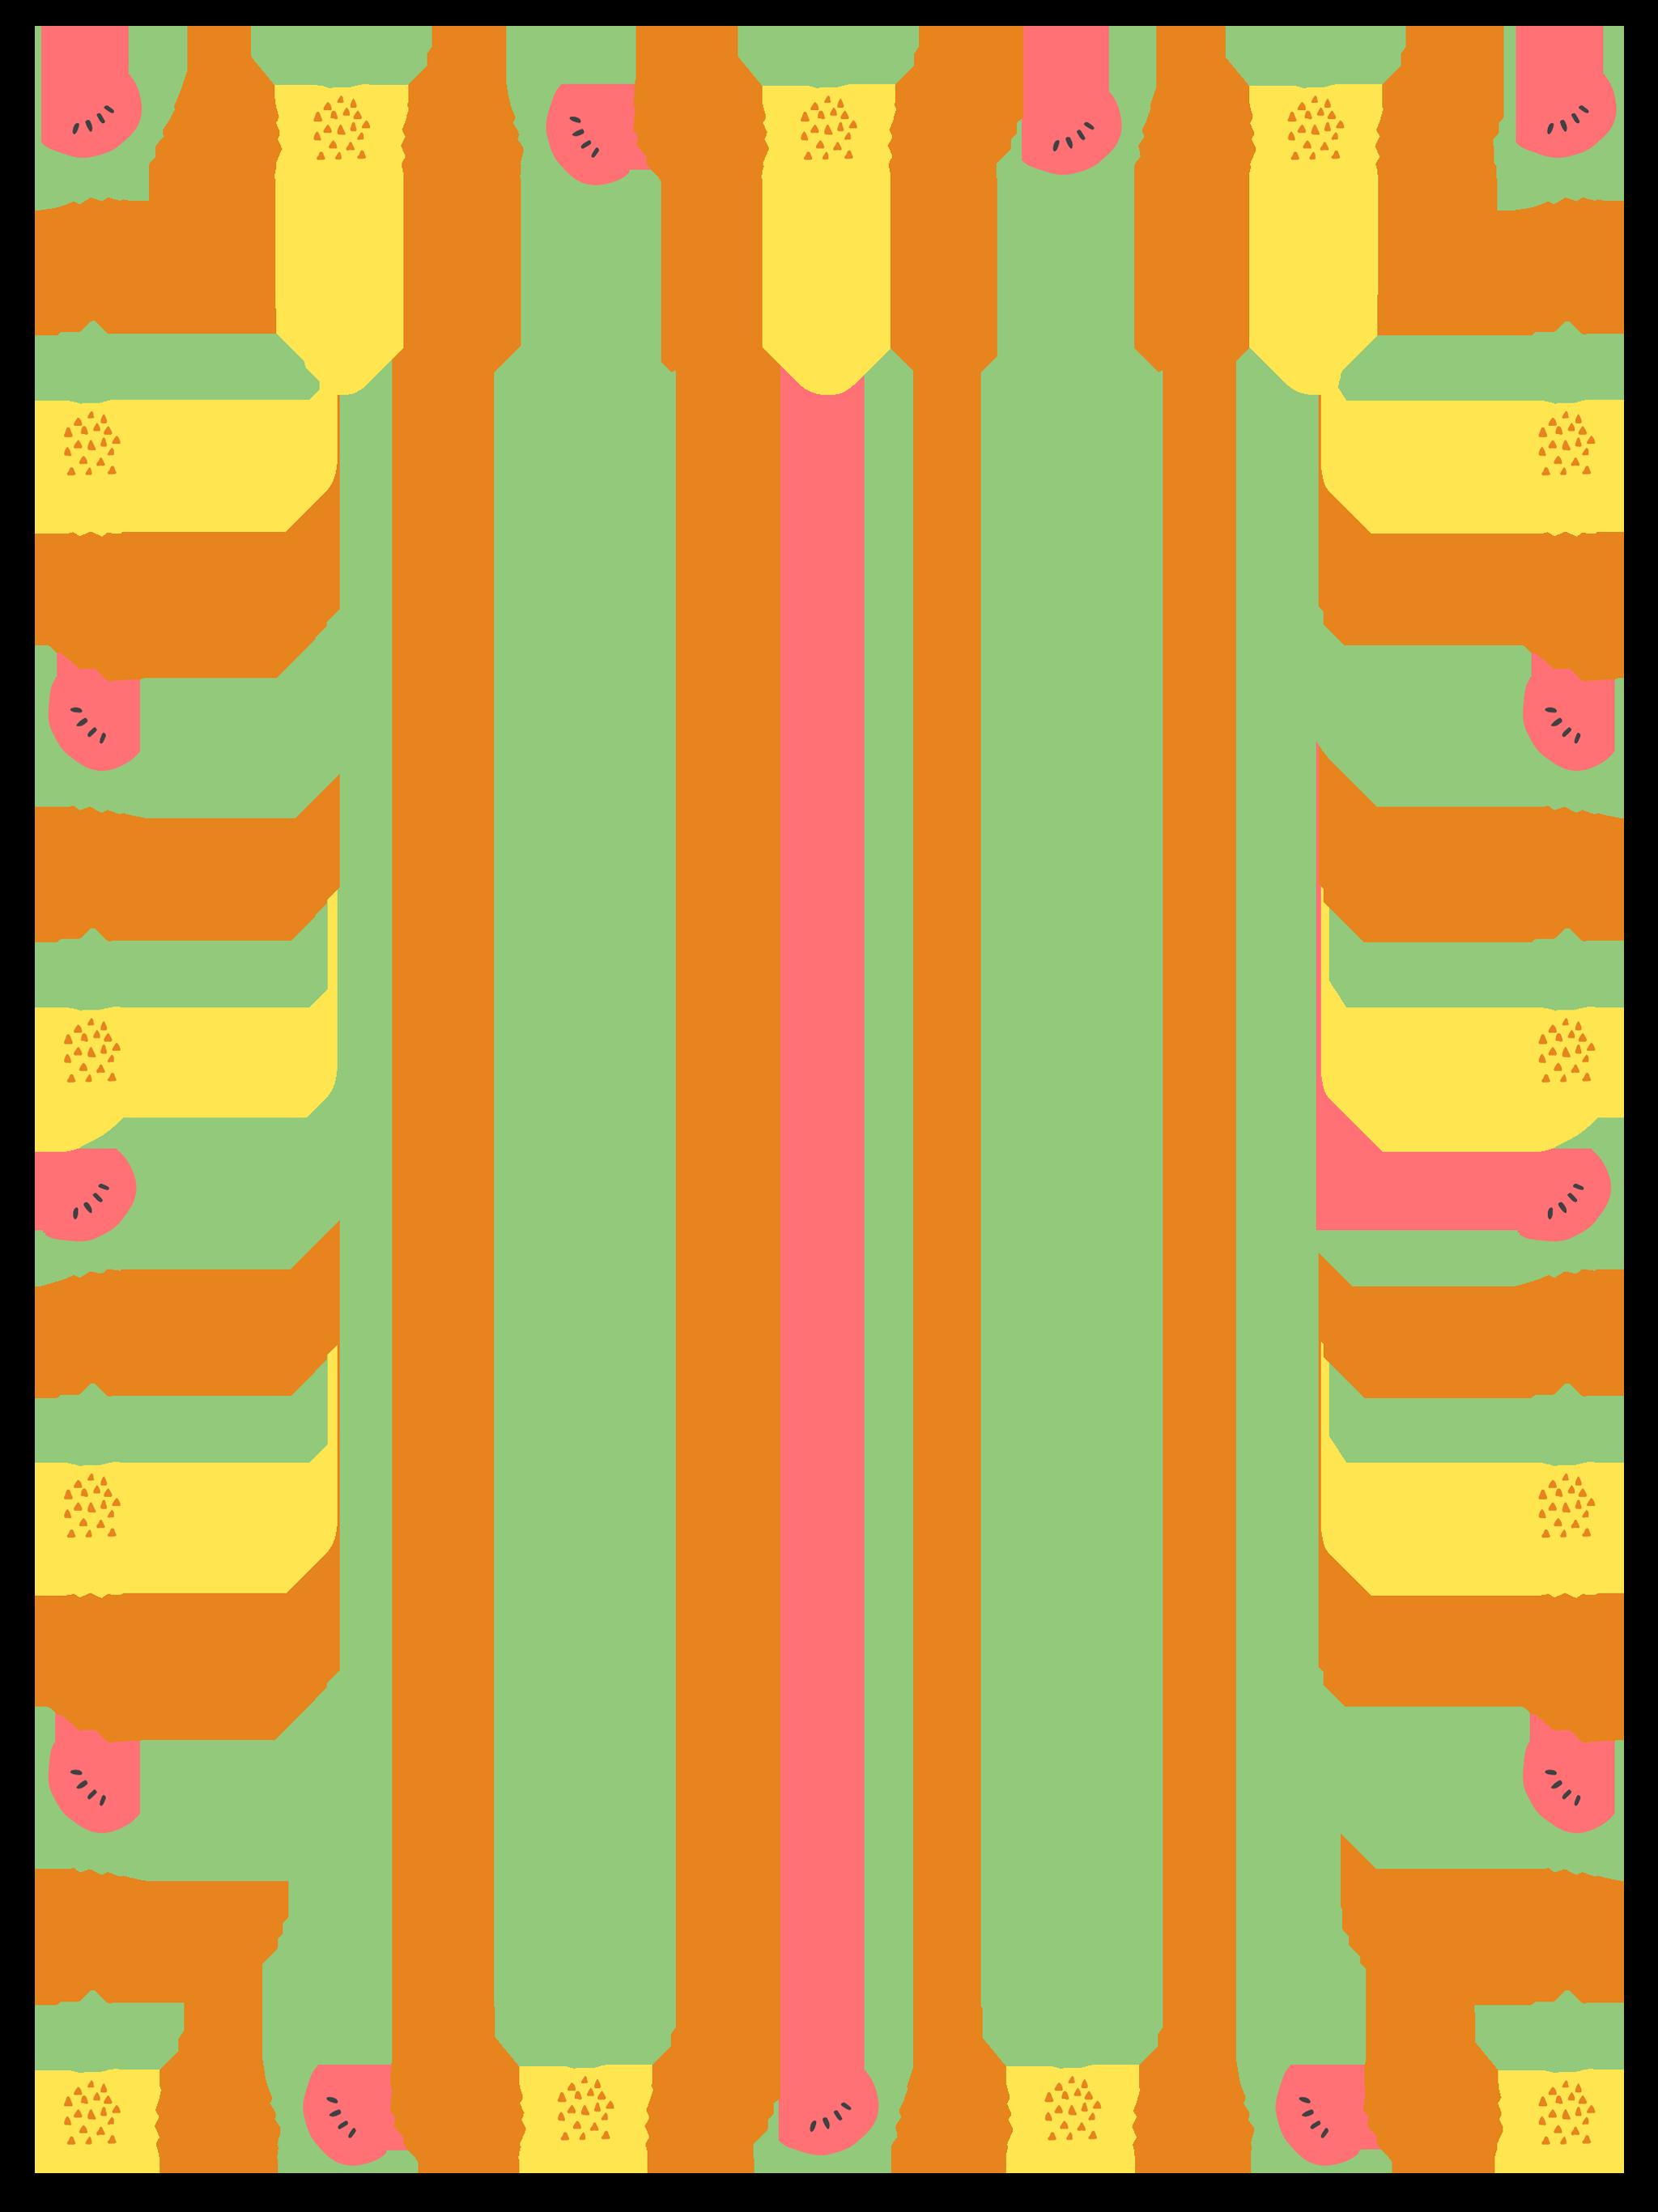 Ipad Vertical_2048x2732_Fruit_Yellow.png